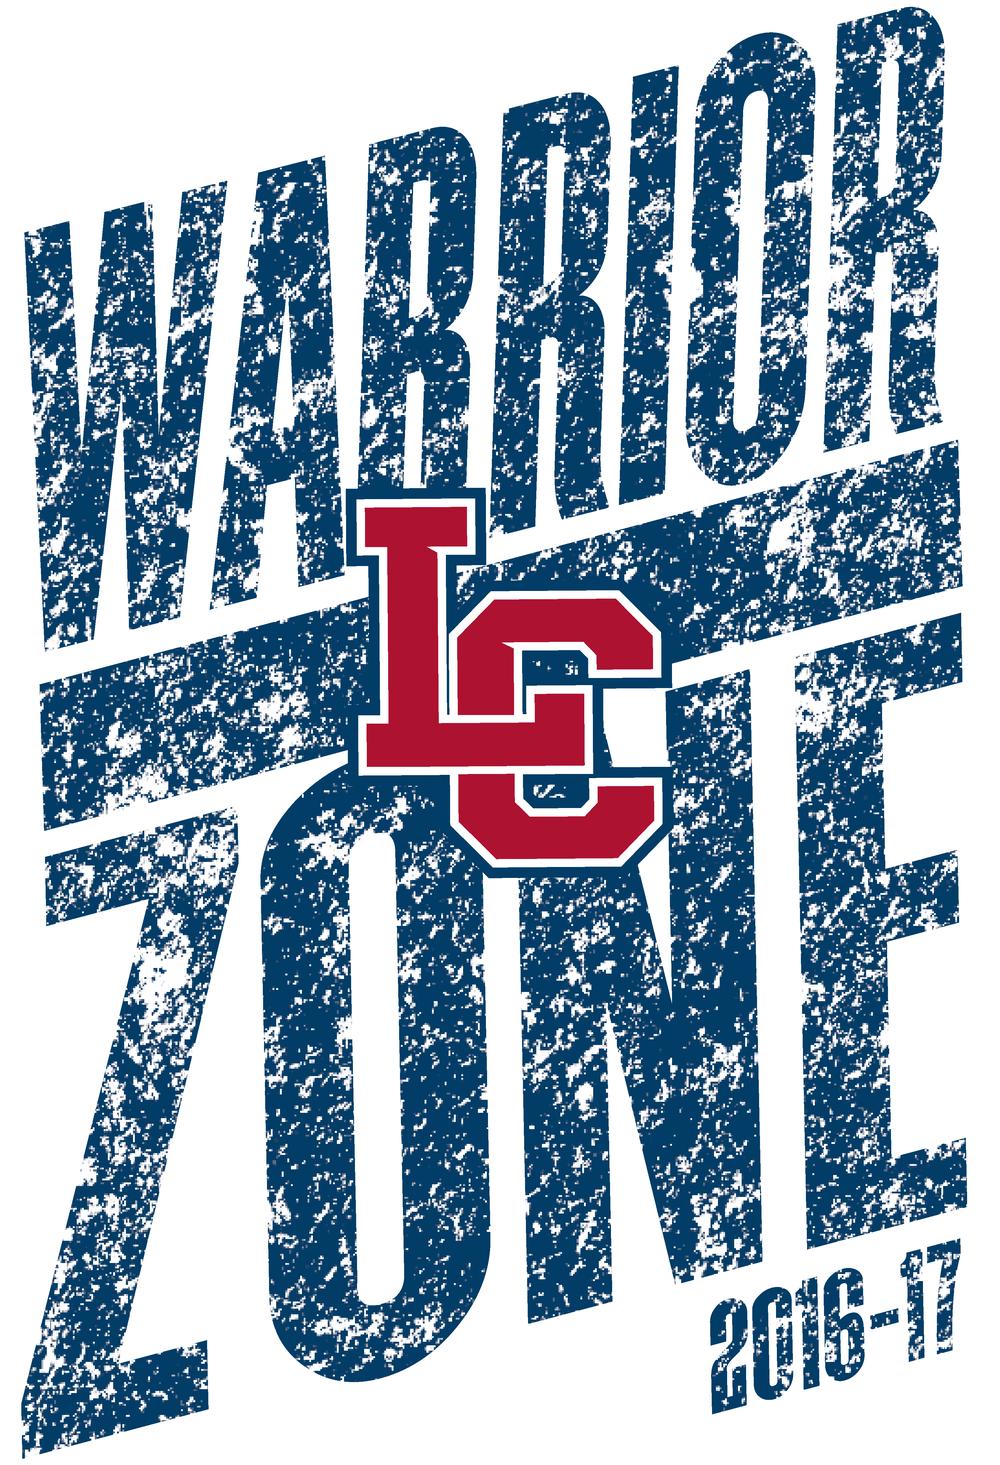 LCSC_2016-08_Athletics_WarriorZone_CHEST-SEPS.png